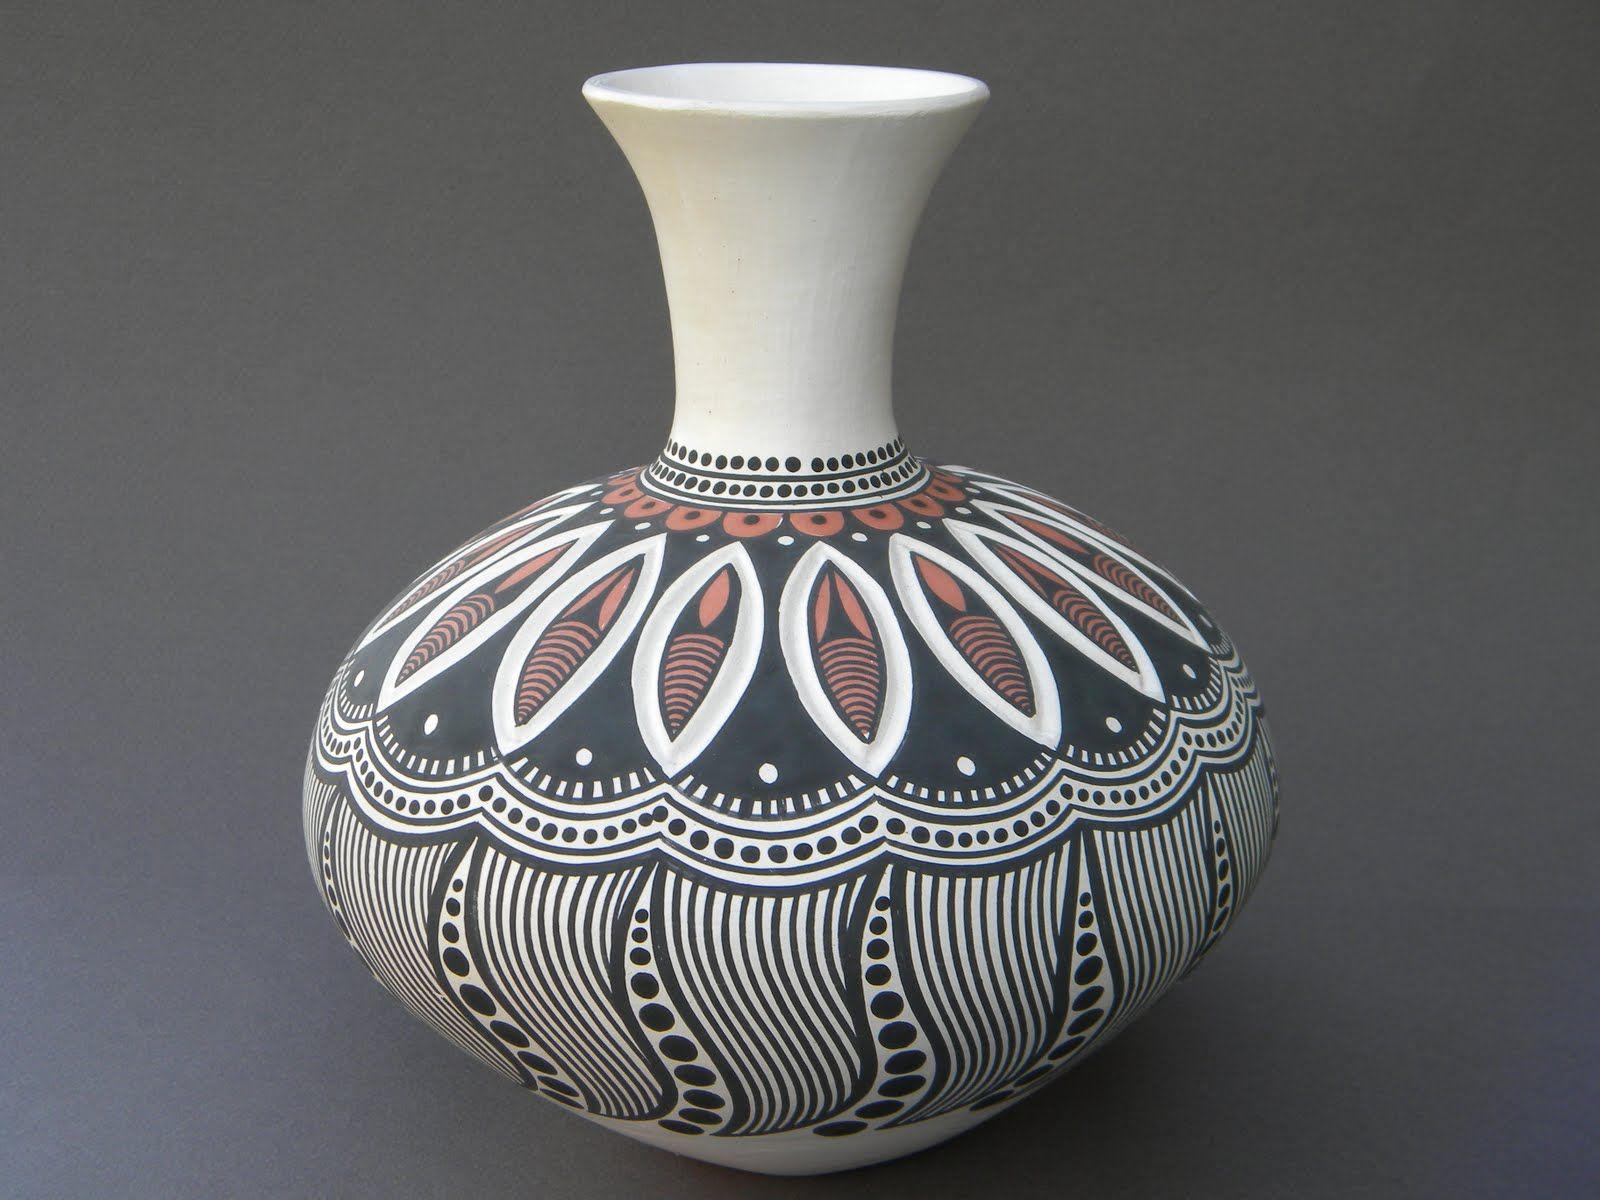 Pottery Gallery Ceramic painting, Pottery pots, Pot designs